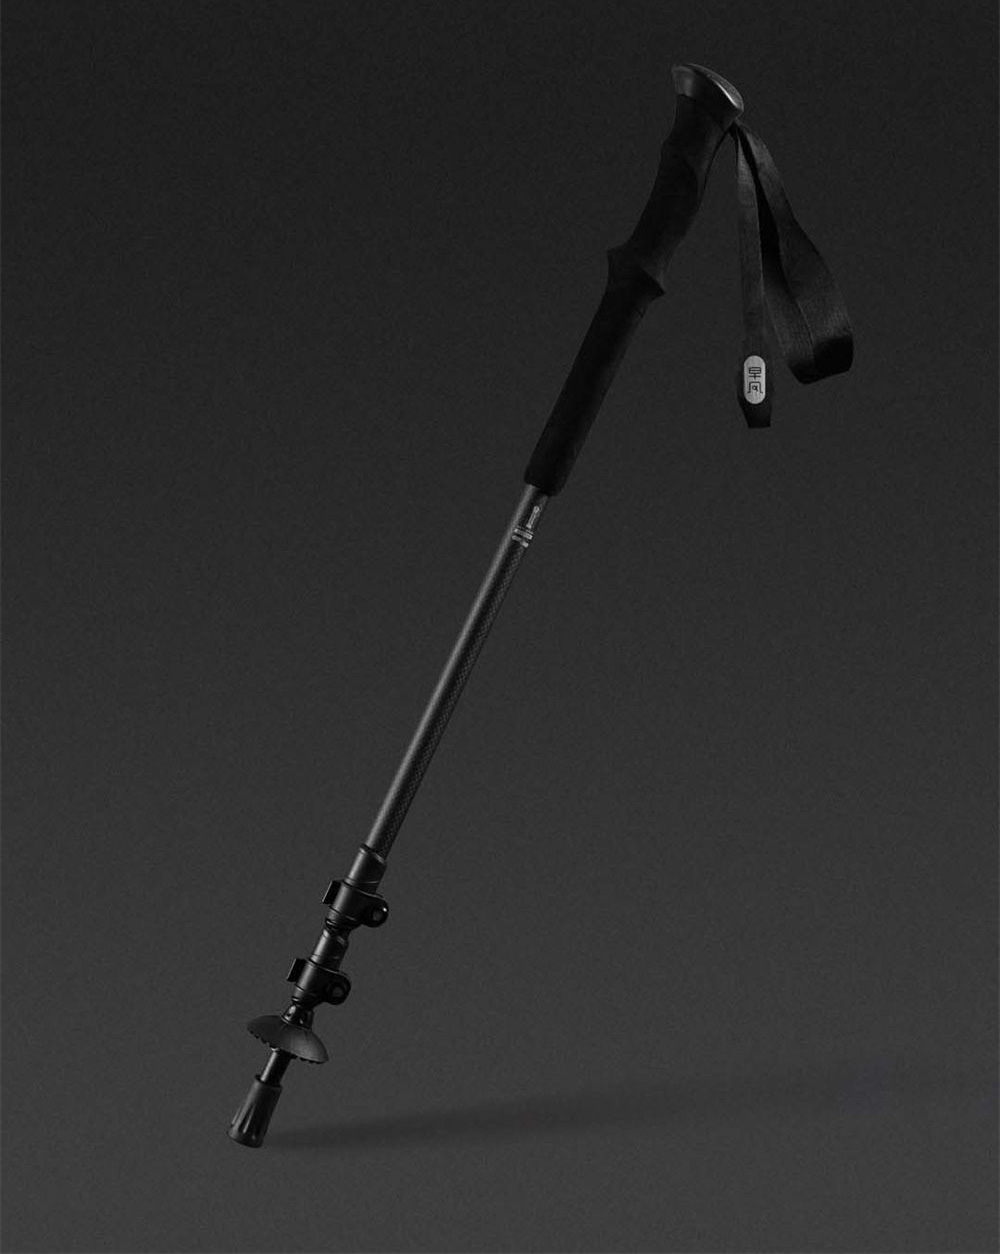 xiaomi zaofeng telescopic trekking pole